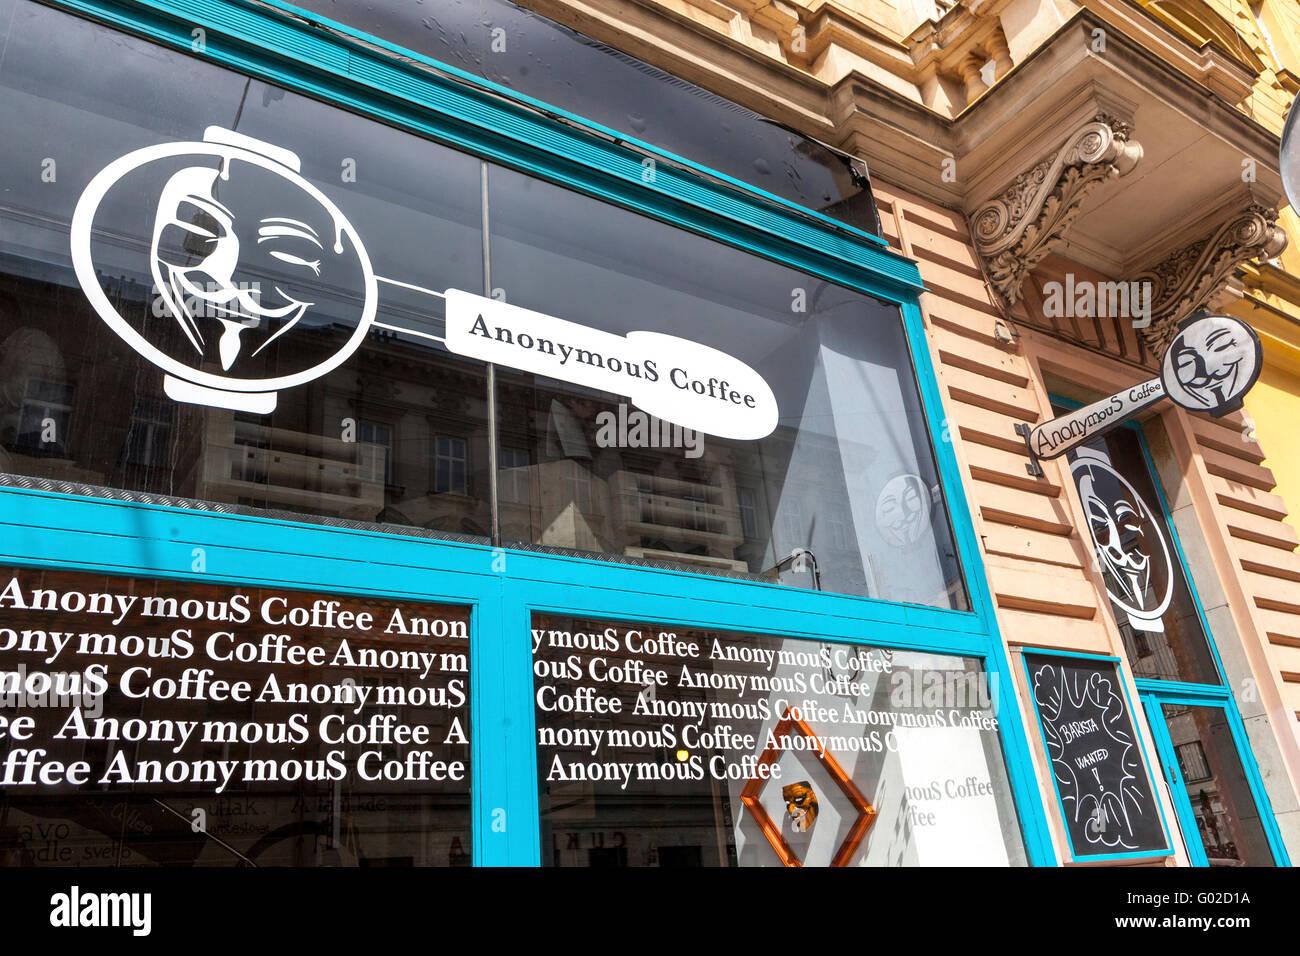 Anonymous Coffee. window display,Zitna street, Prague. Czech Republic - Stock Image